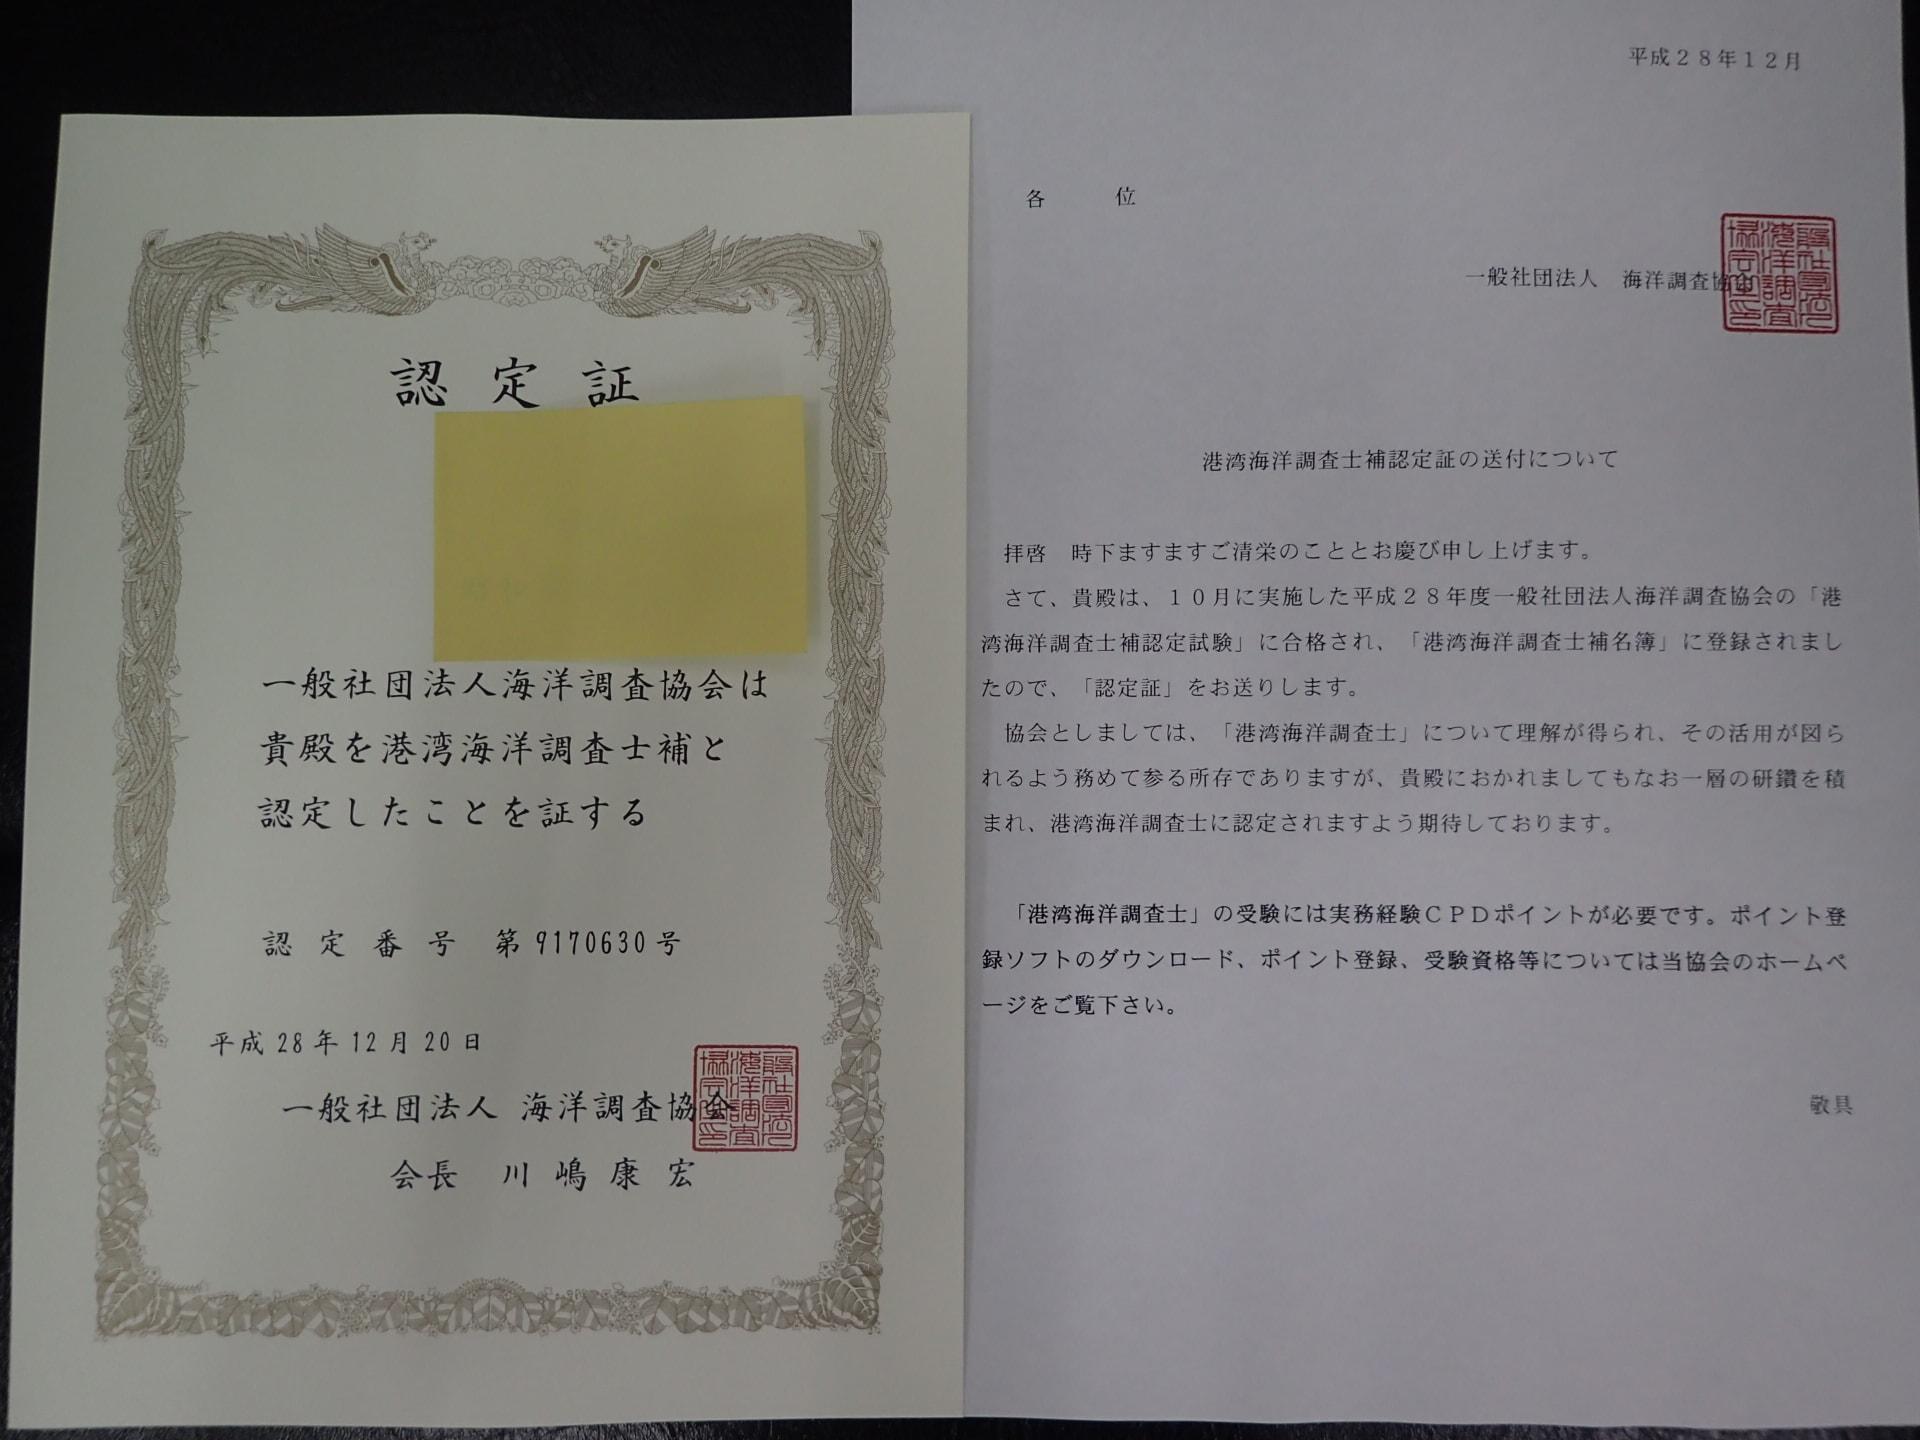 New Japan Development CO